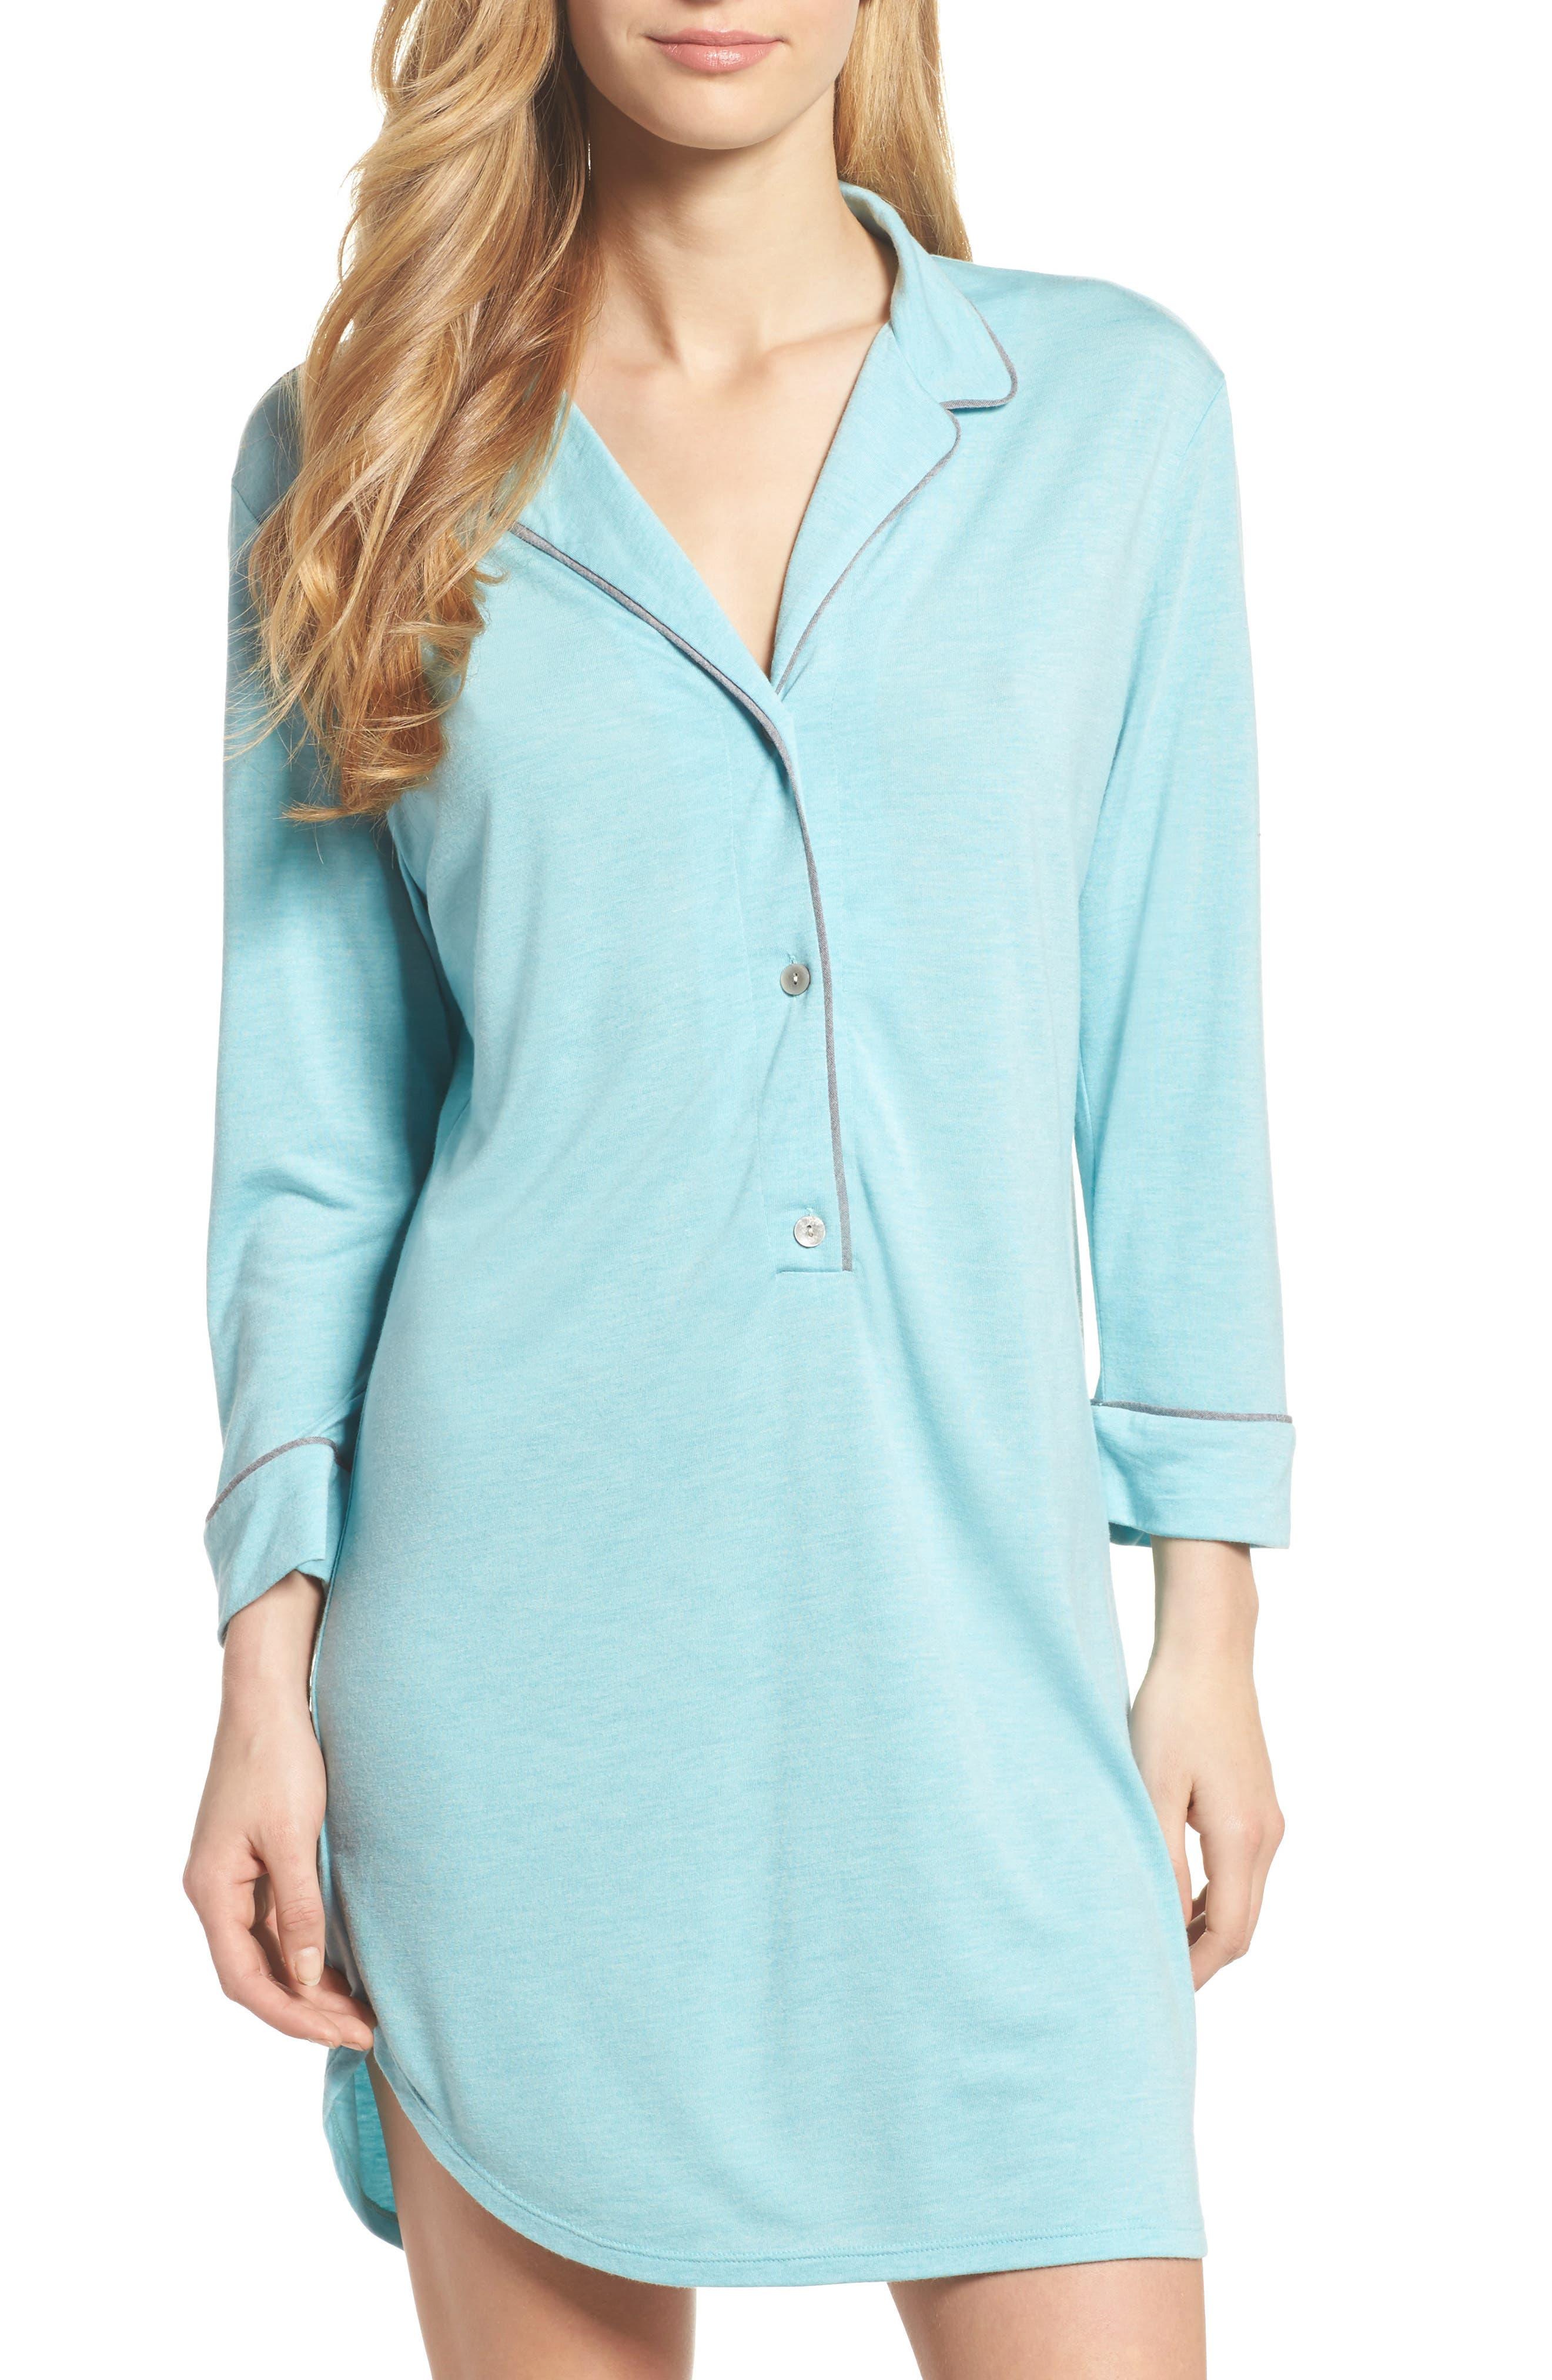 Shangri-La Sleep Shirt,                         Main,                         color, 400